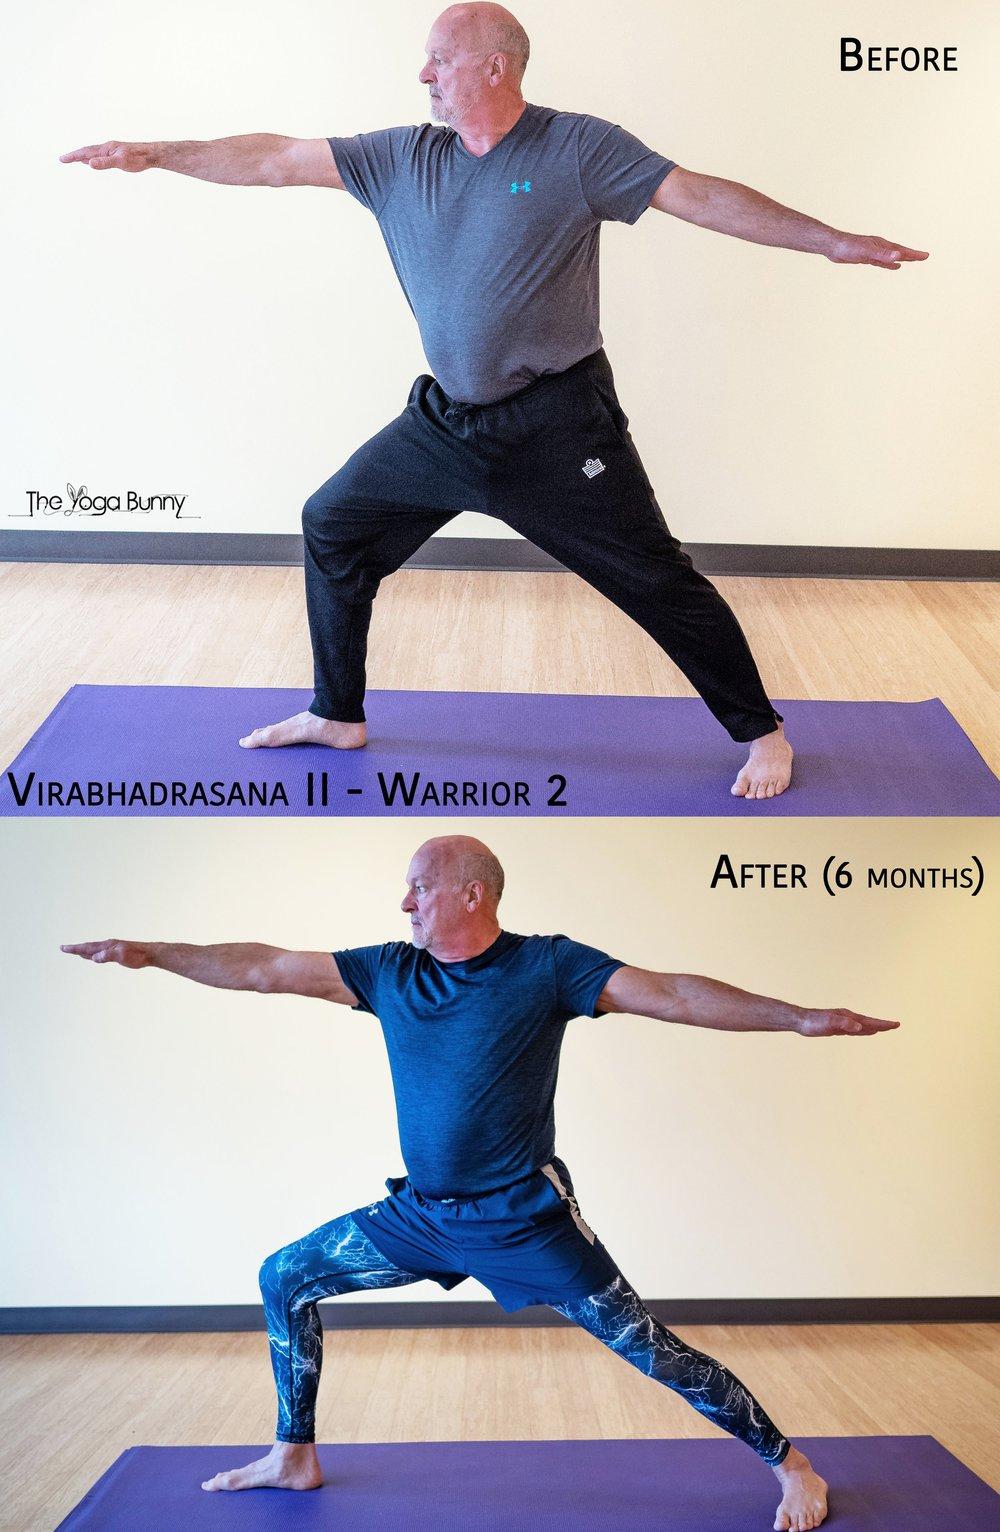 Virabhadrasana II - Warrior 2